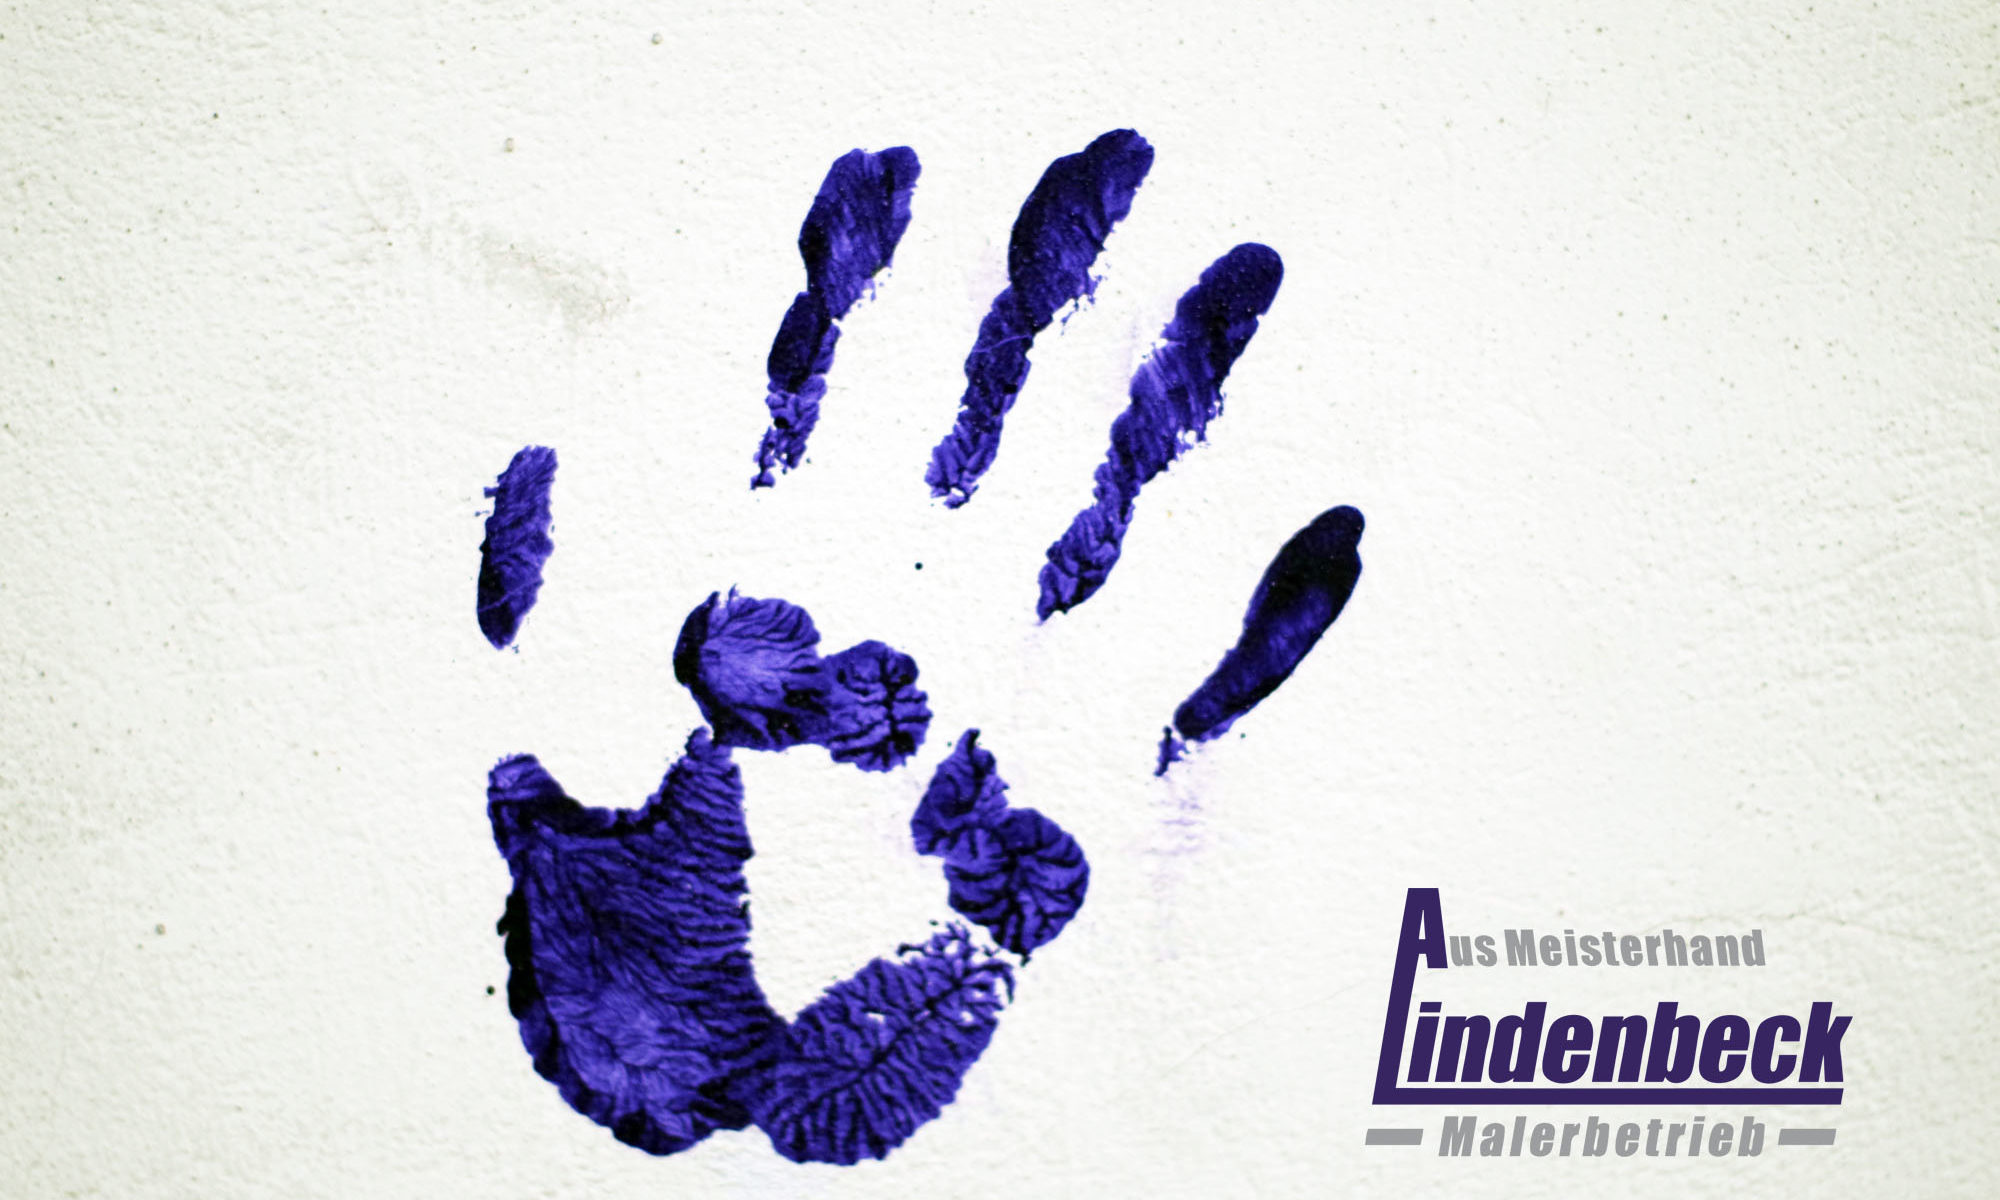 Meisterhand statt Kinderhand: Armin Lindenbeck, Malermeister für Remscheid, Wuppertal, Solingen, Wermelskirchen, Rade, ...